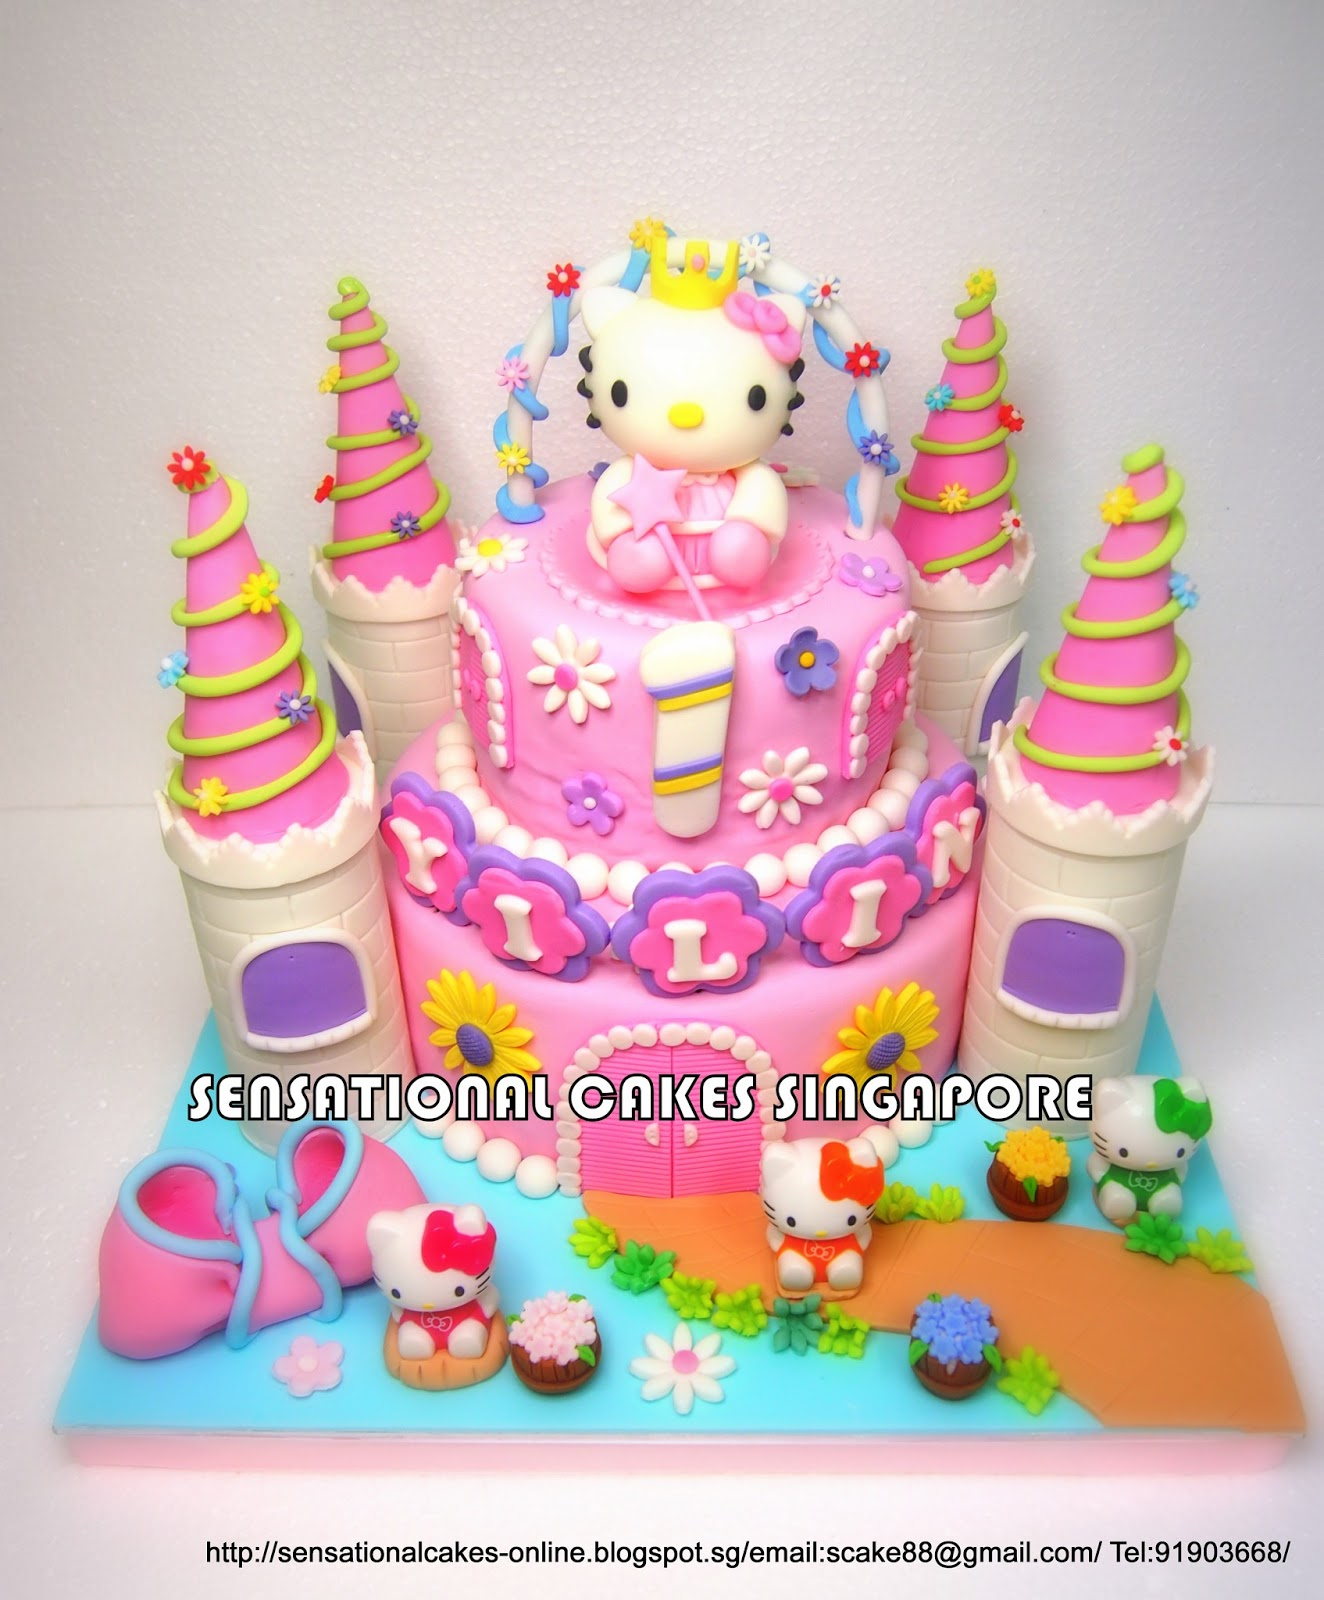 The Sensational Cakes Spectacular Princess Kitty Cake Singapore W